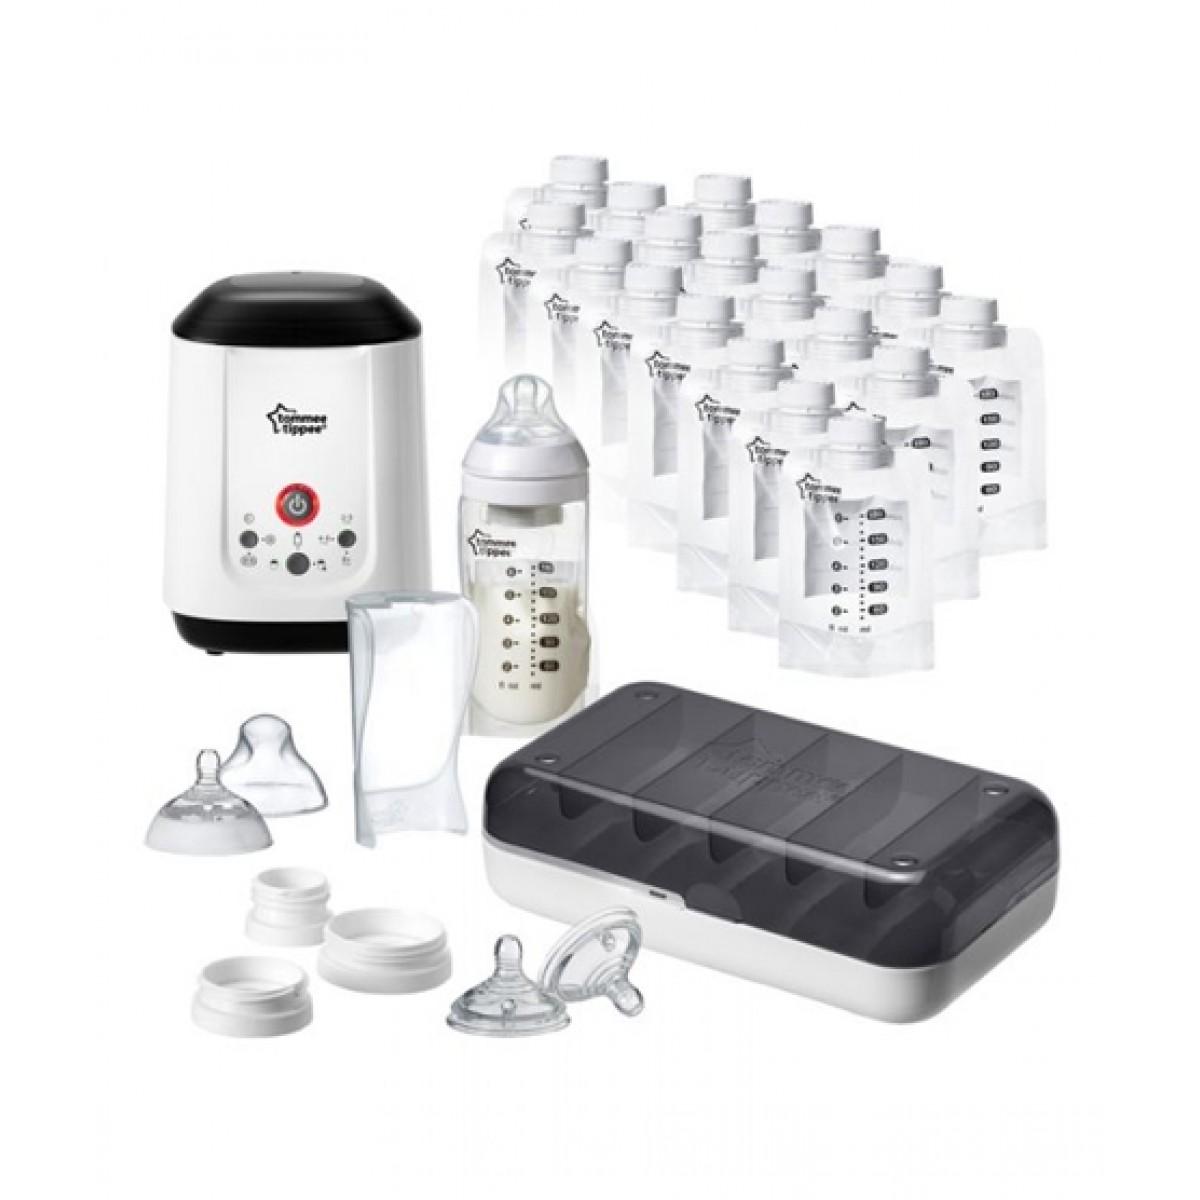 Tommee Tippee Complete Breast Milk Starter Set (TT-423570)